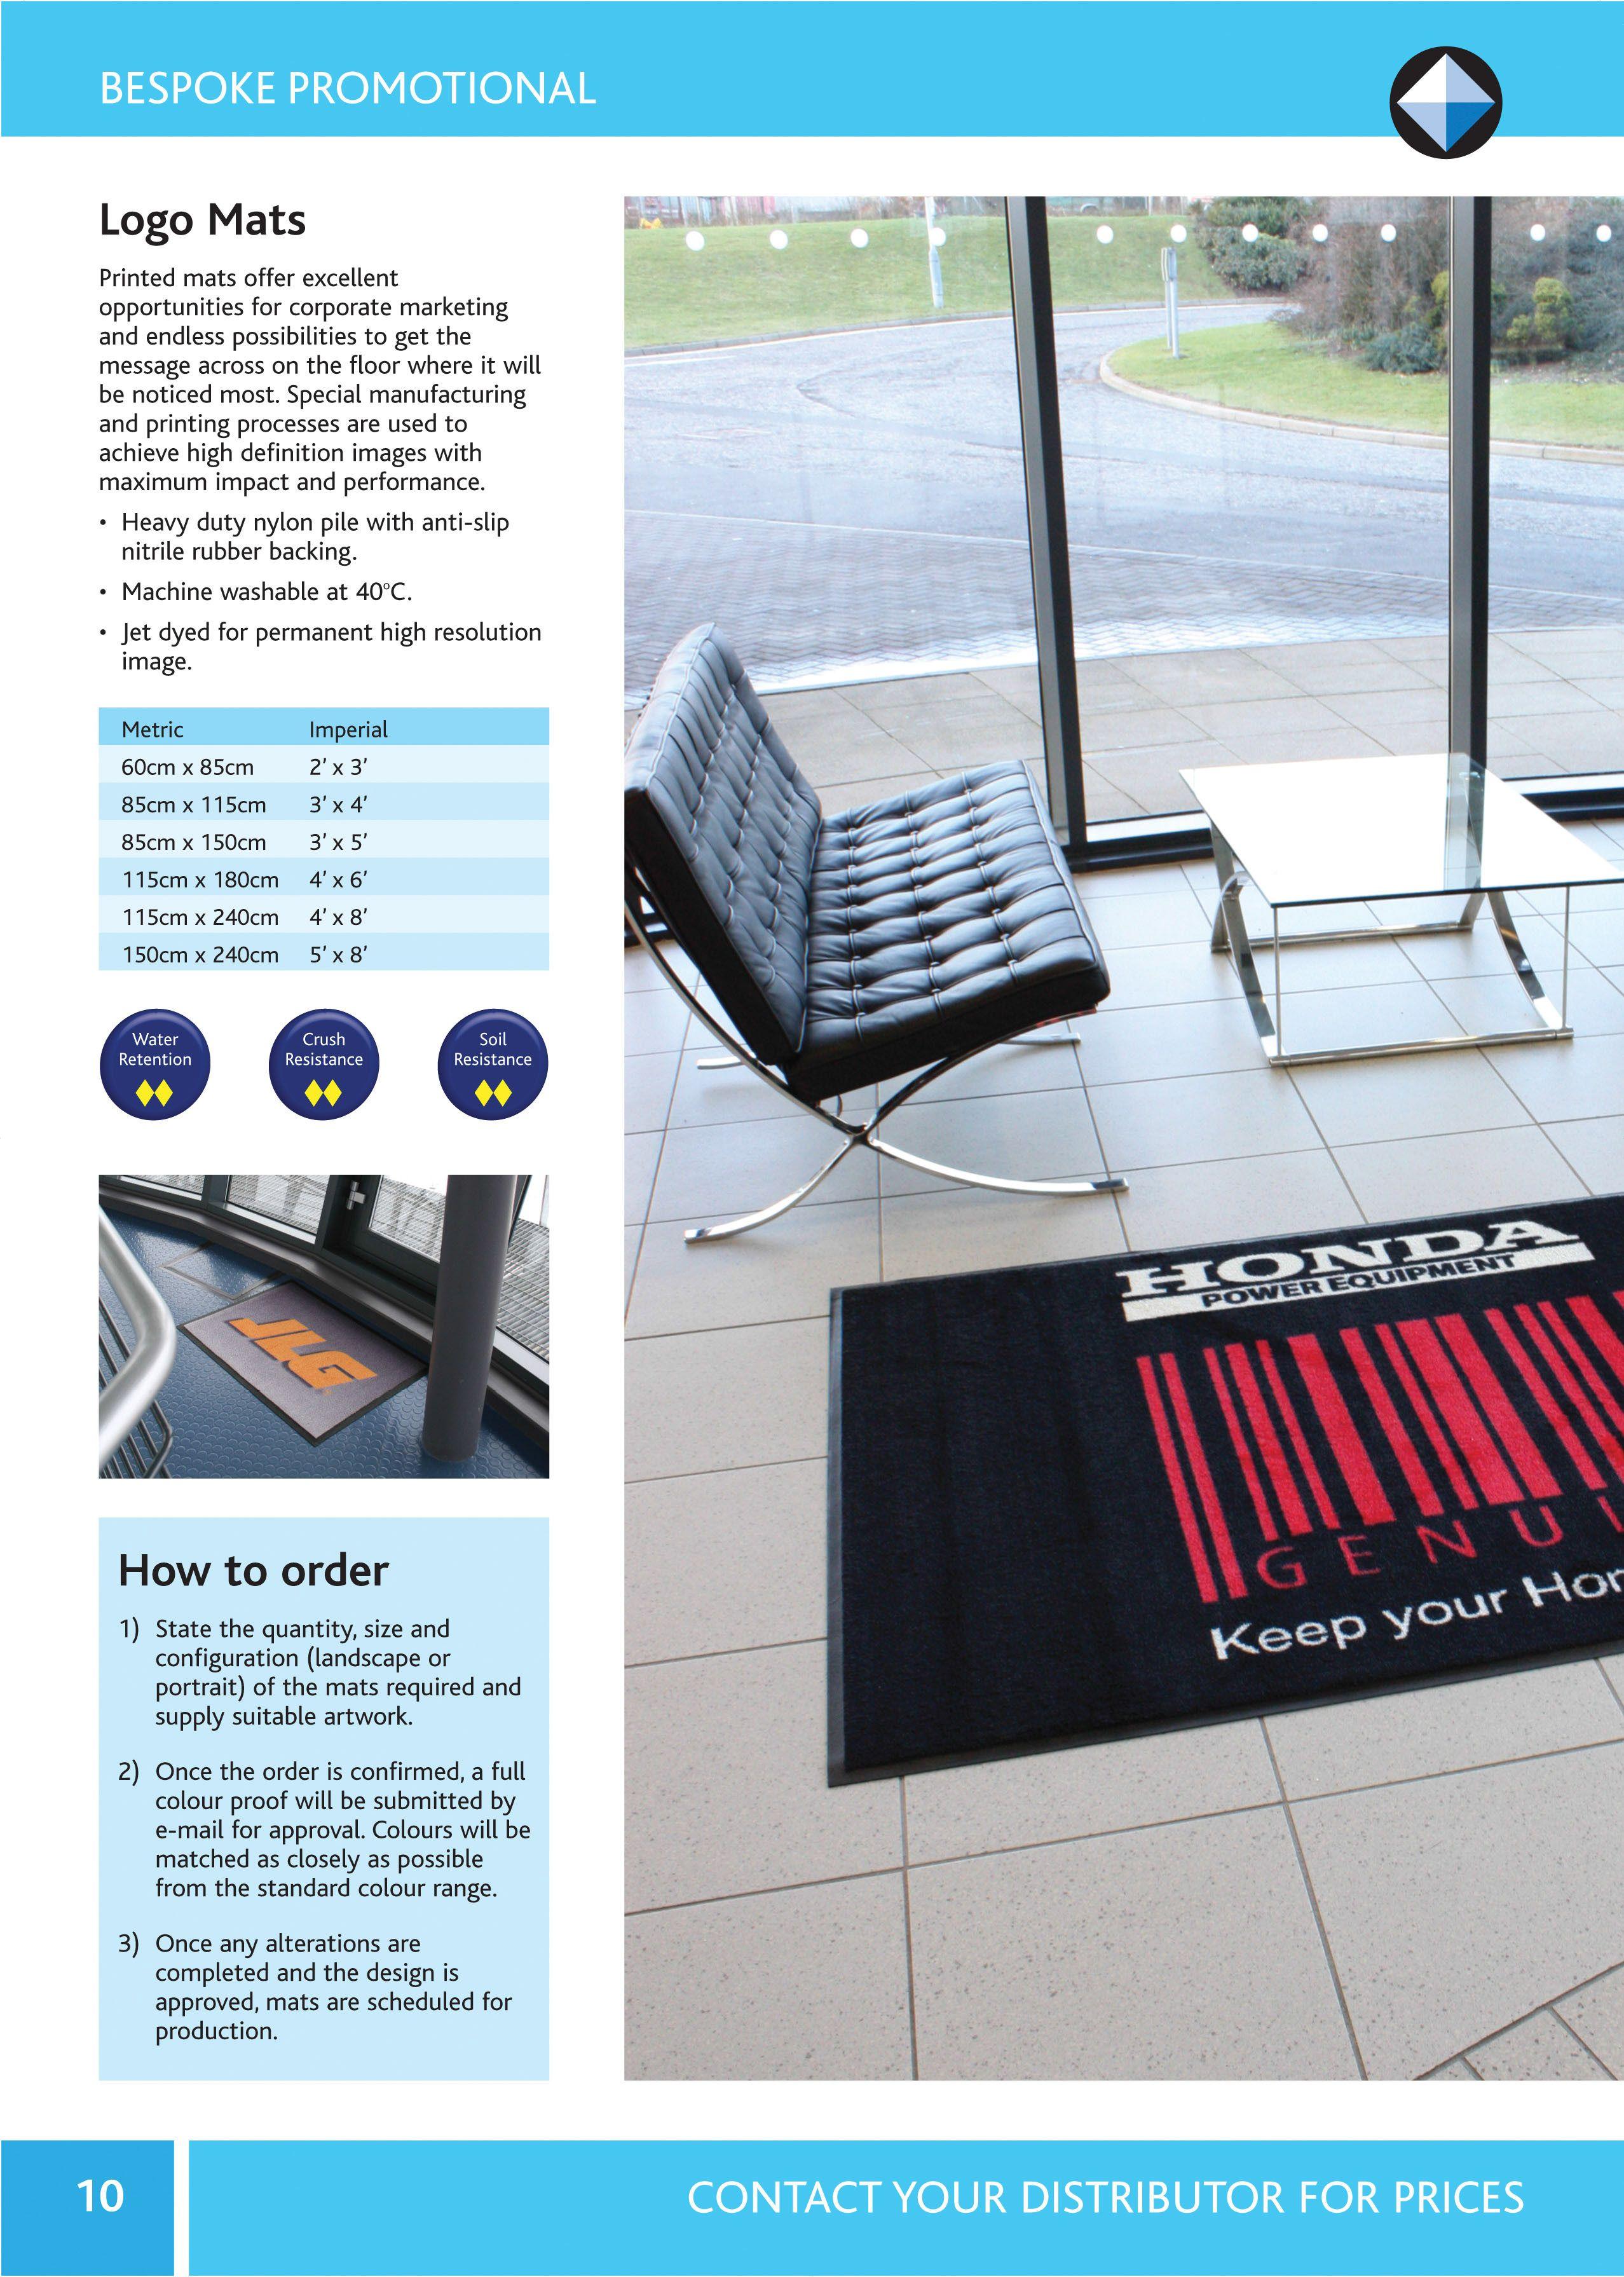 Bespoke Promotional Mats from Blue Diamond Industrial